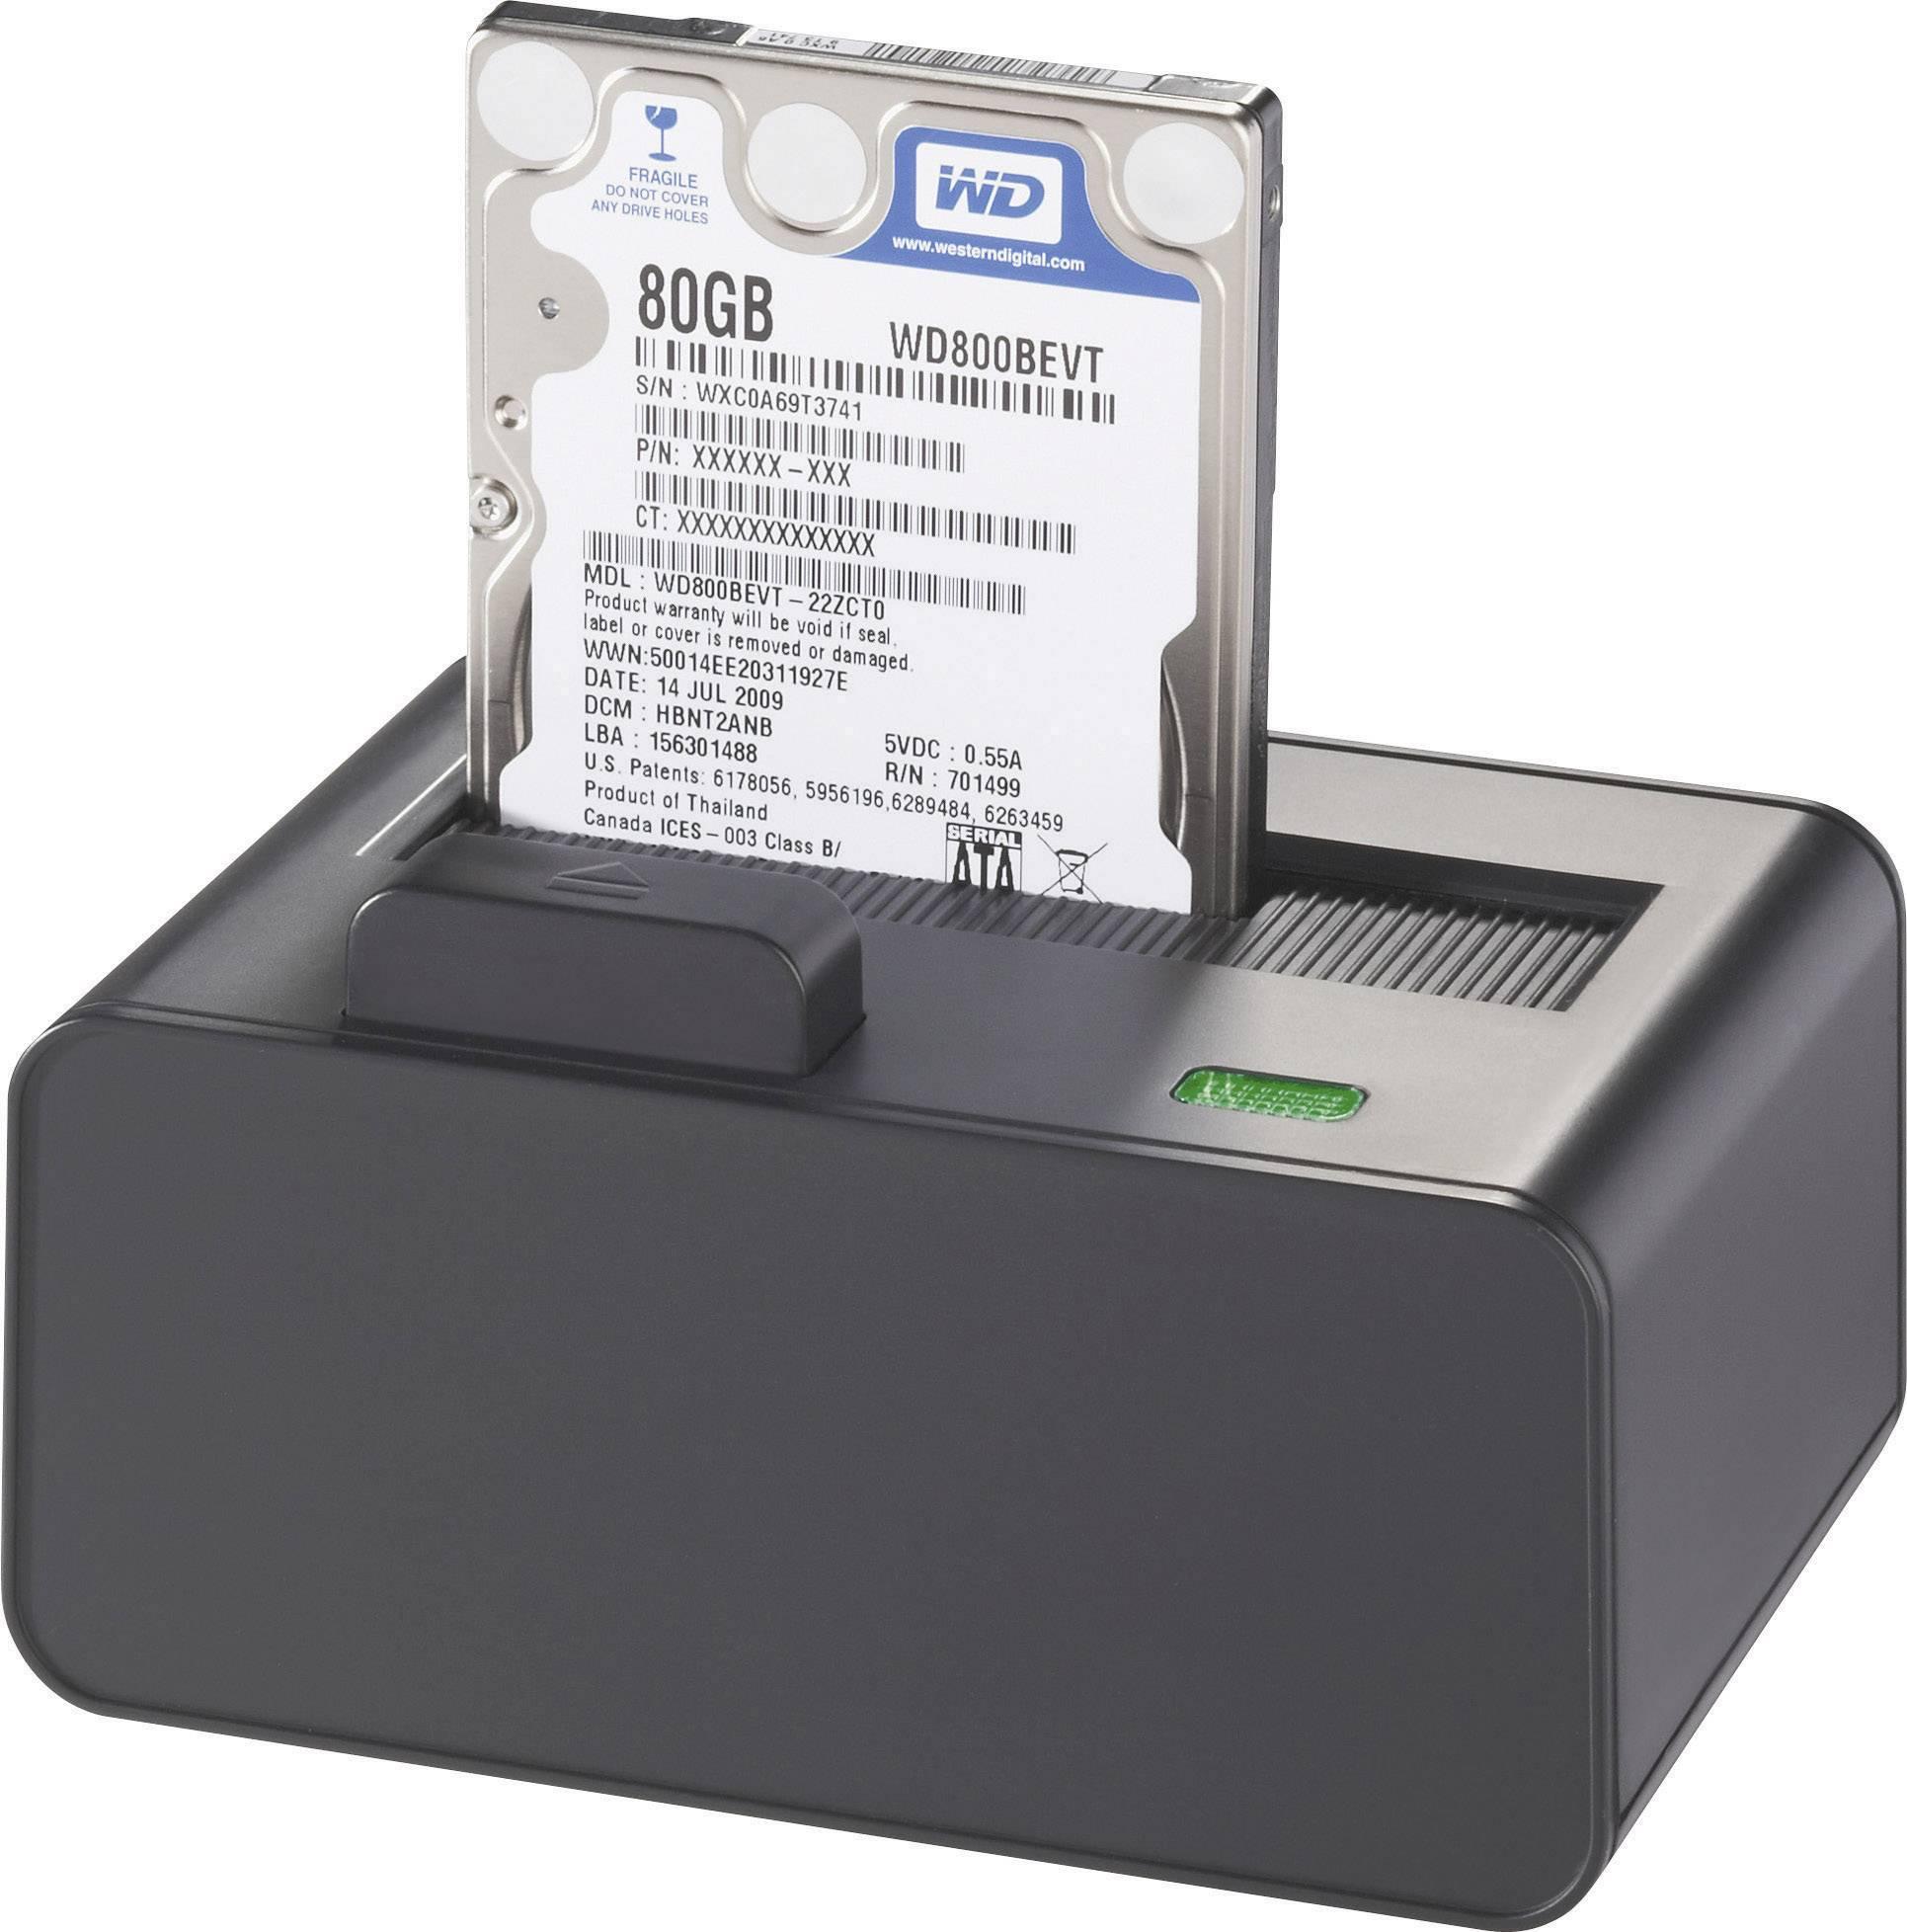 Dokovací stanice pro pevný disk Renkforce rf-docking-01 RF-3039978, SATA, USB 2.0, eSATA